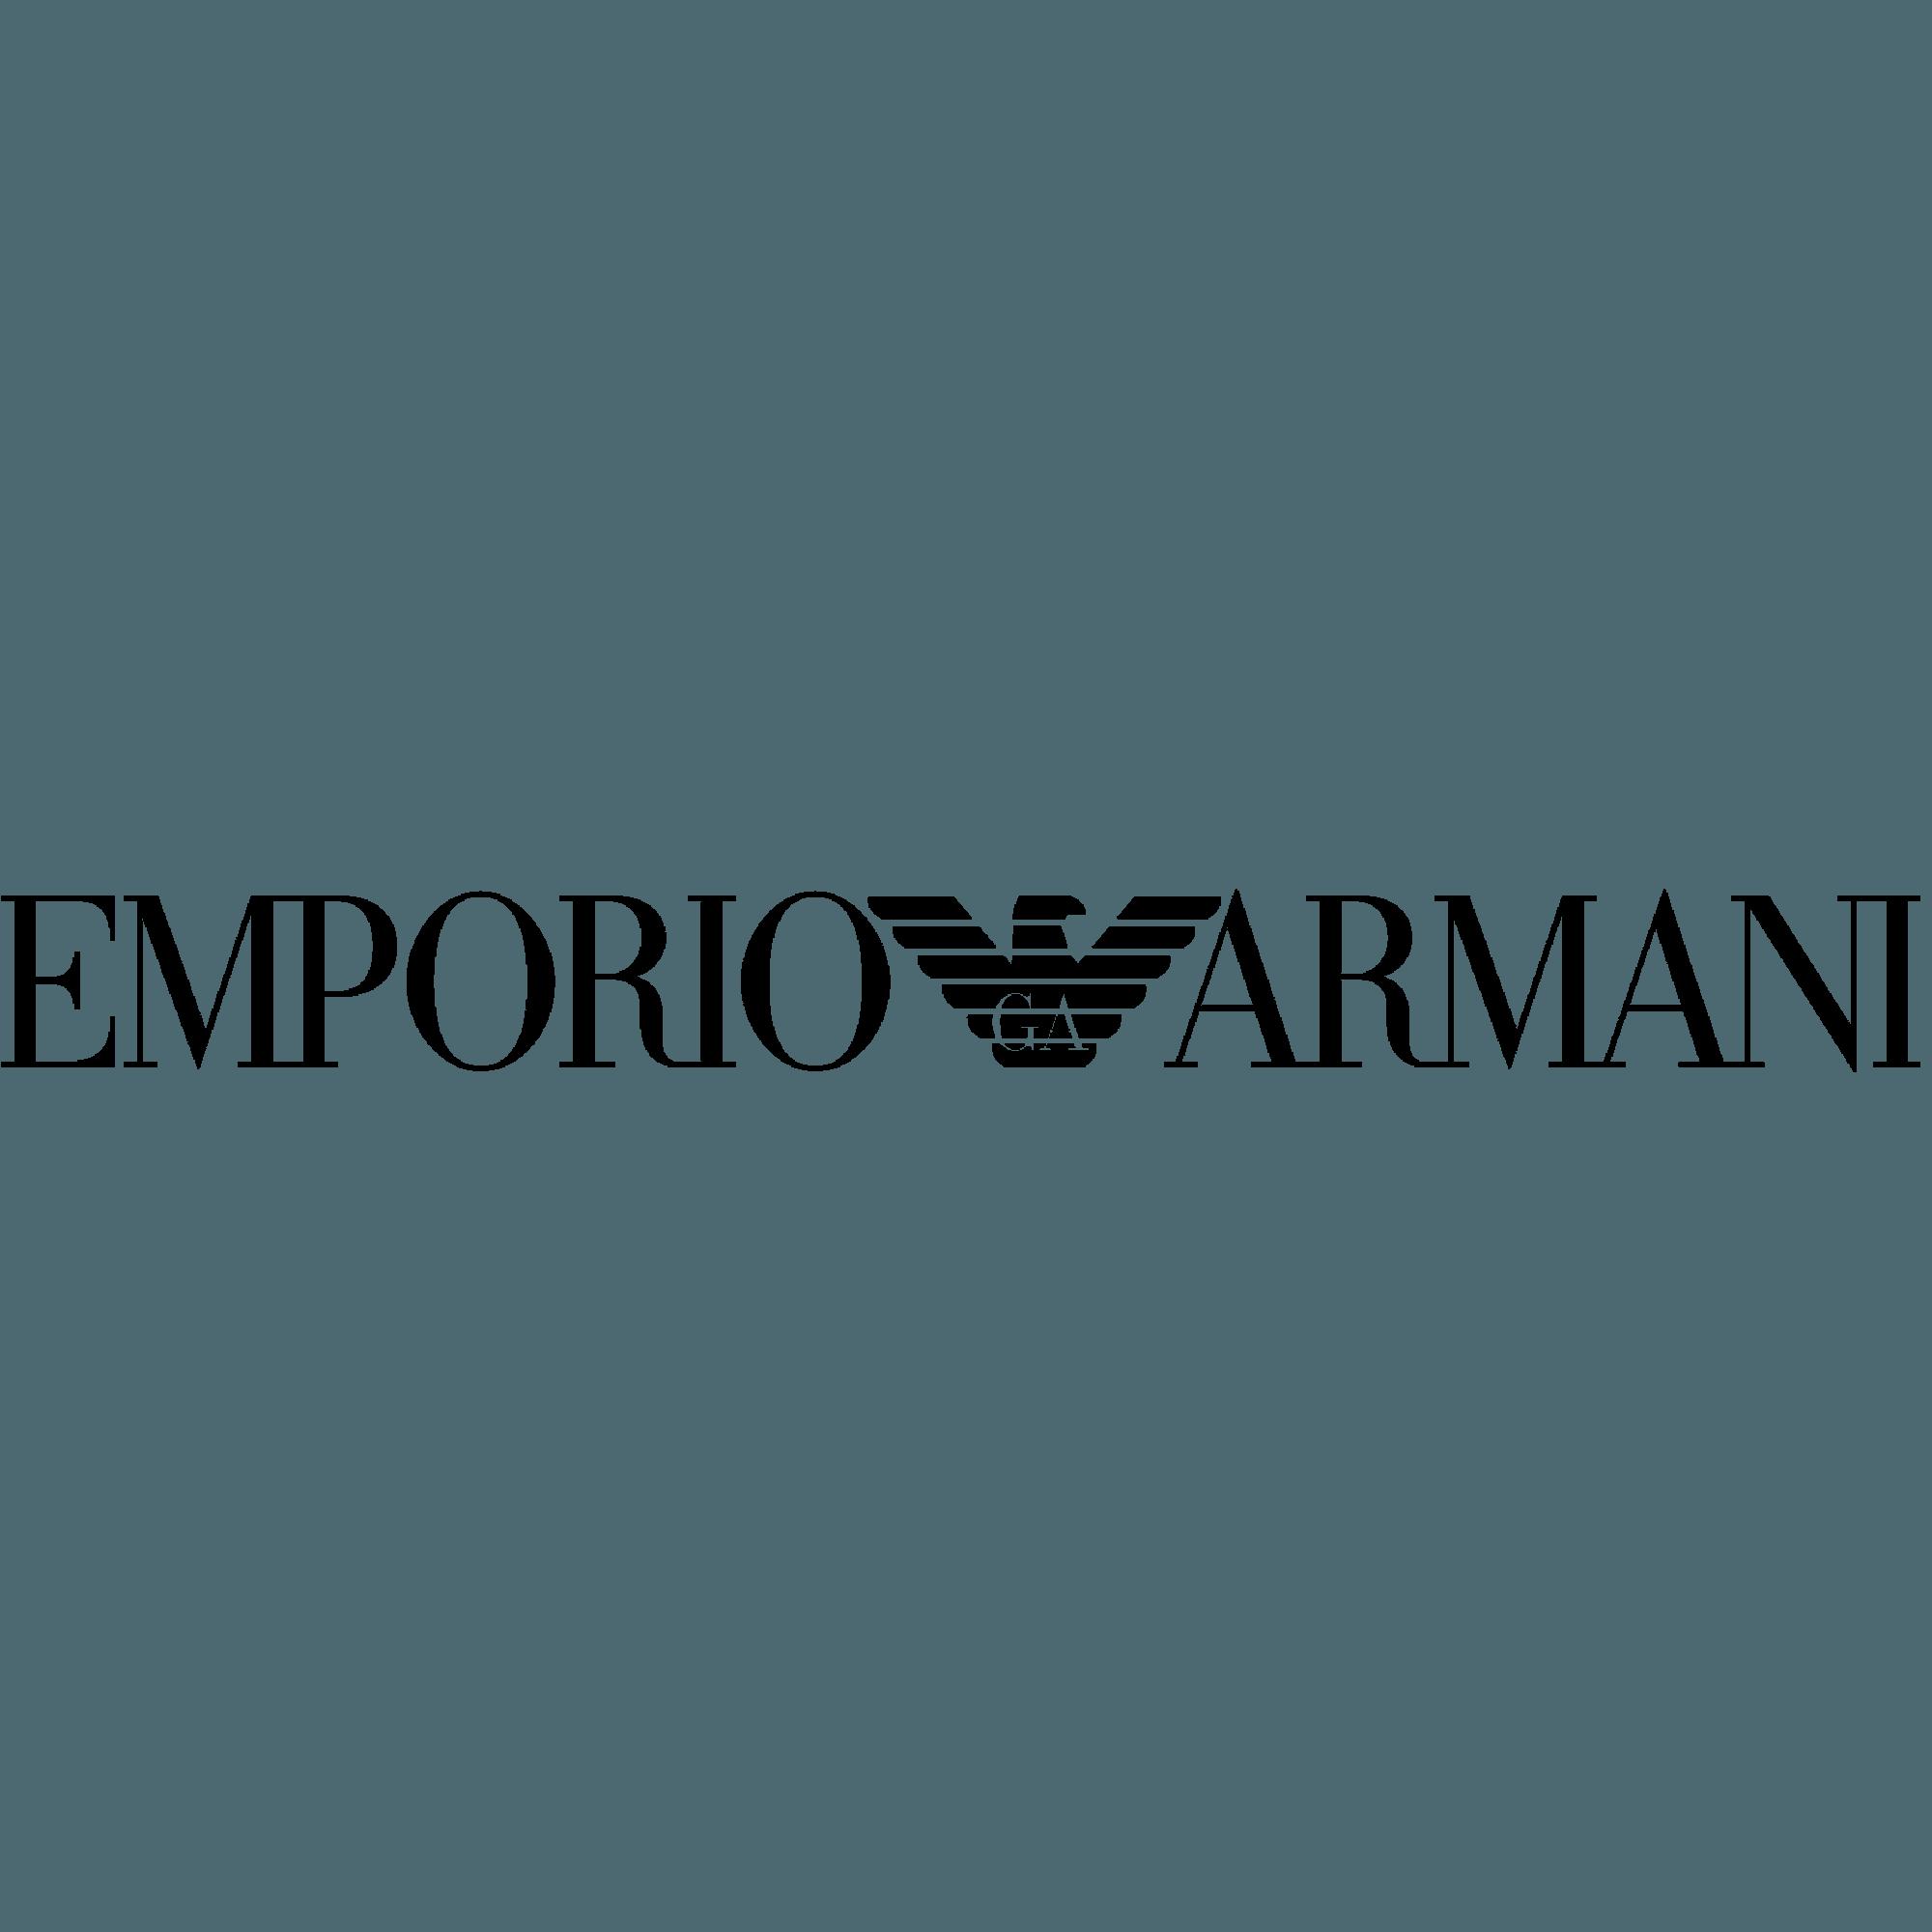 Emporio Armani Logo PNG - 179933